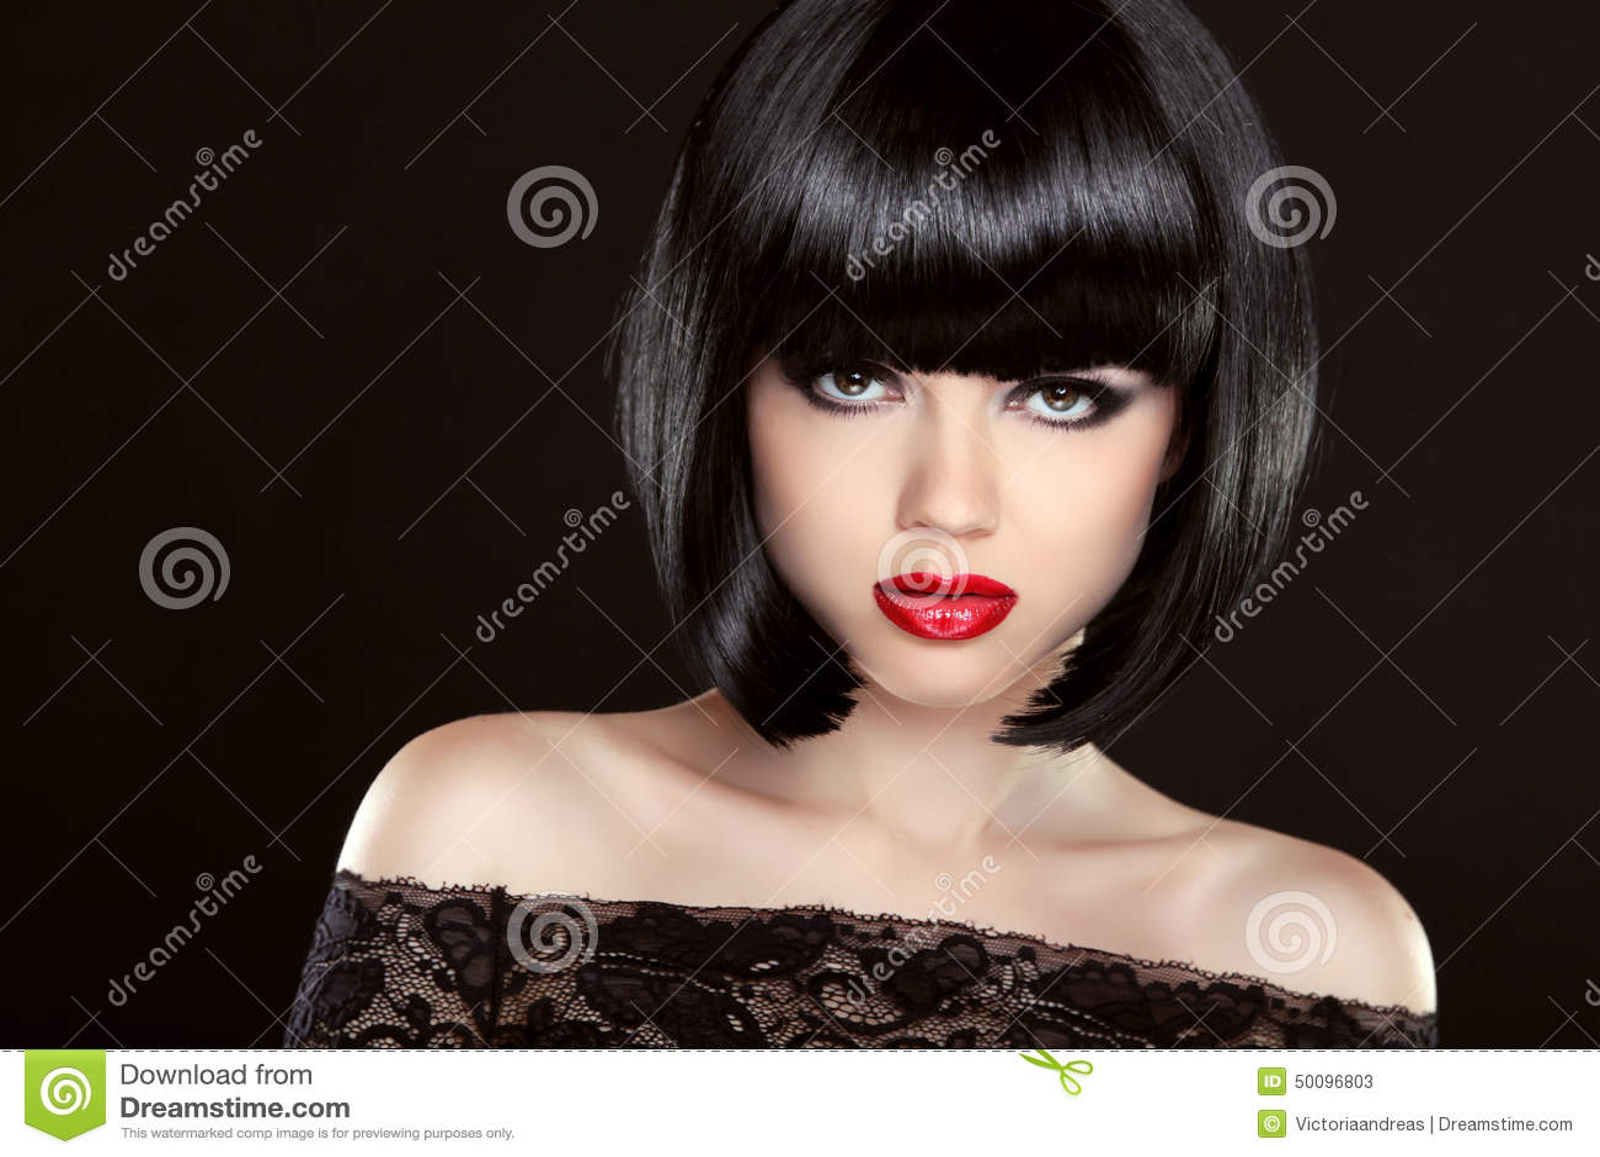 Стрижка волос черная магия